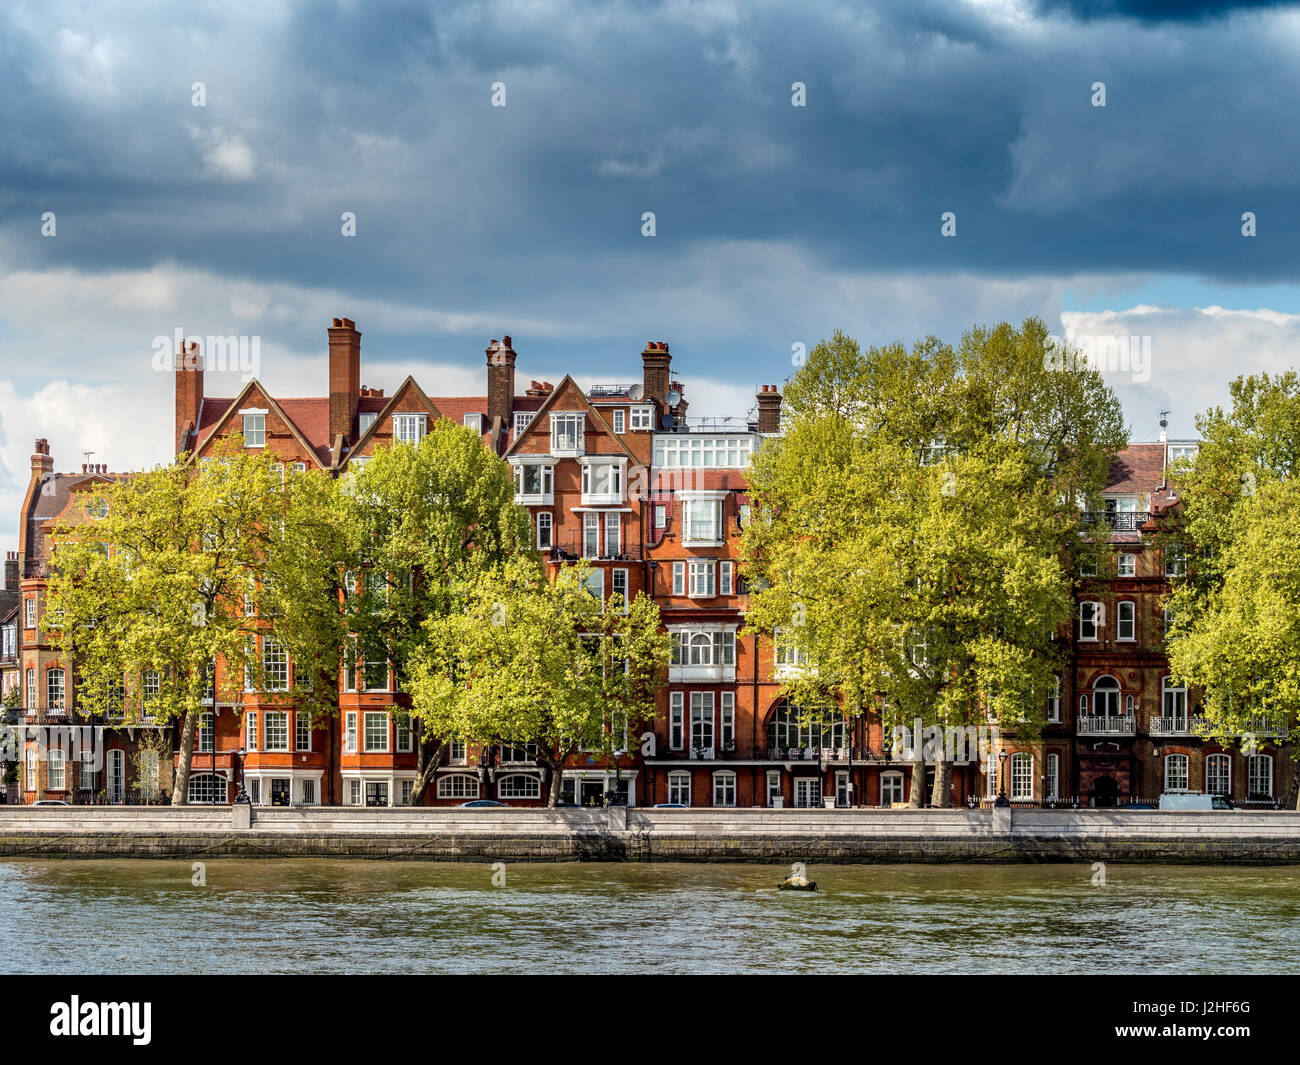 Houses along Chelsea Embankment, North bank of the river Thames, London, UK. - Stock Image